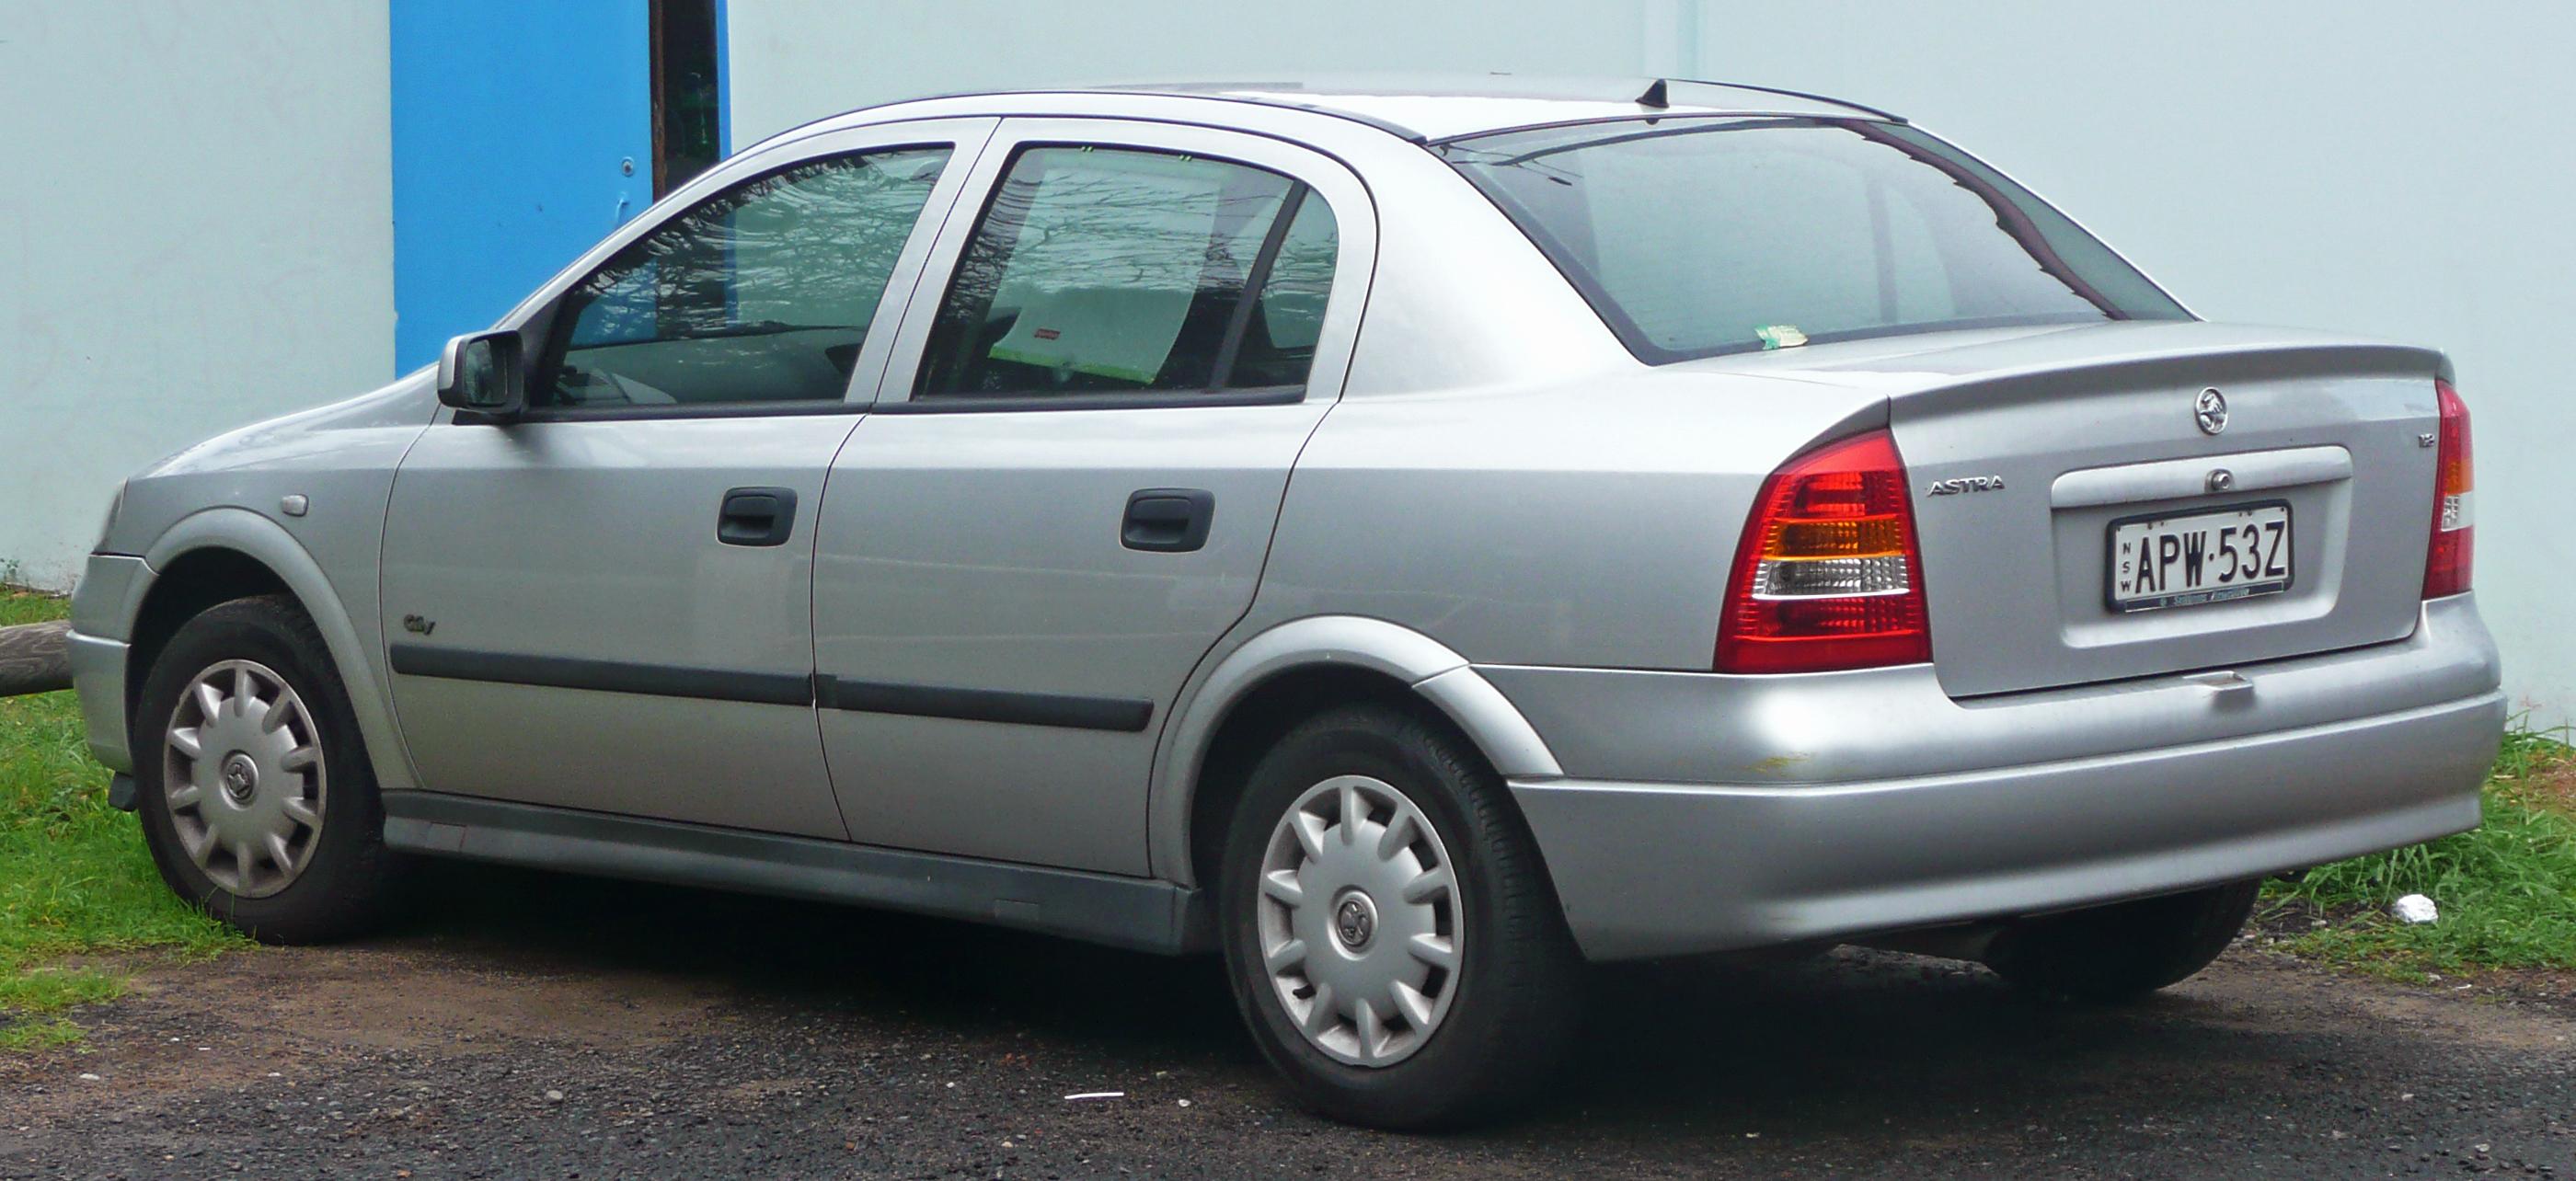 2004 Holden Astra 06 Fuse Box Location File 2001 Ts City Sedan 2010 17 Rh Commons Wikimedia Org Cdx Diagram